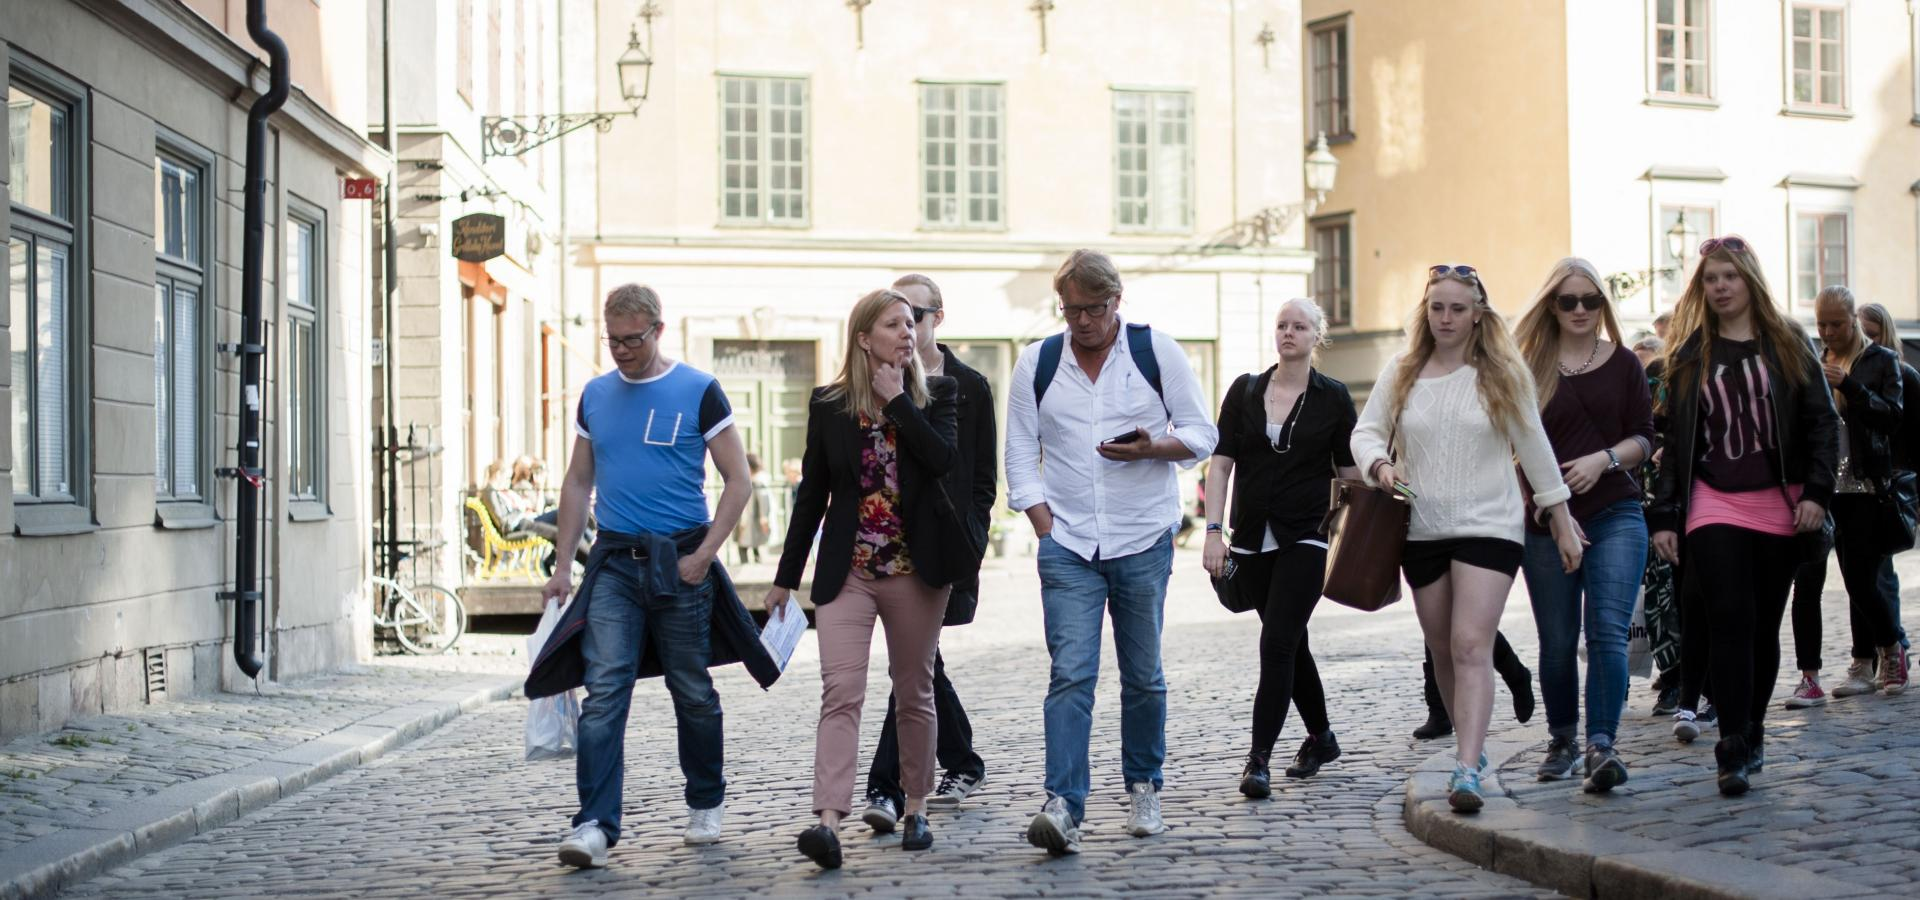 Turism, att beska Kristianstad - Kristianstads kommun